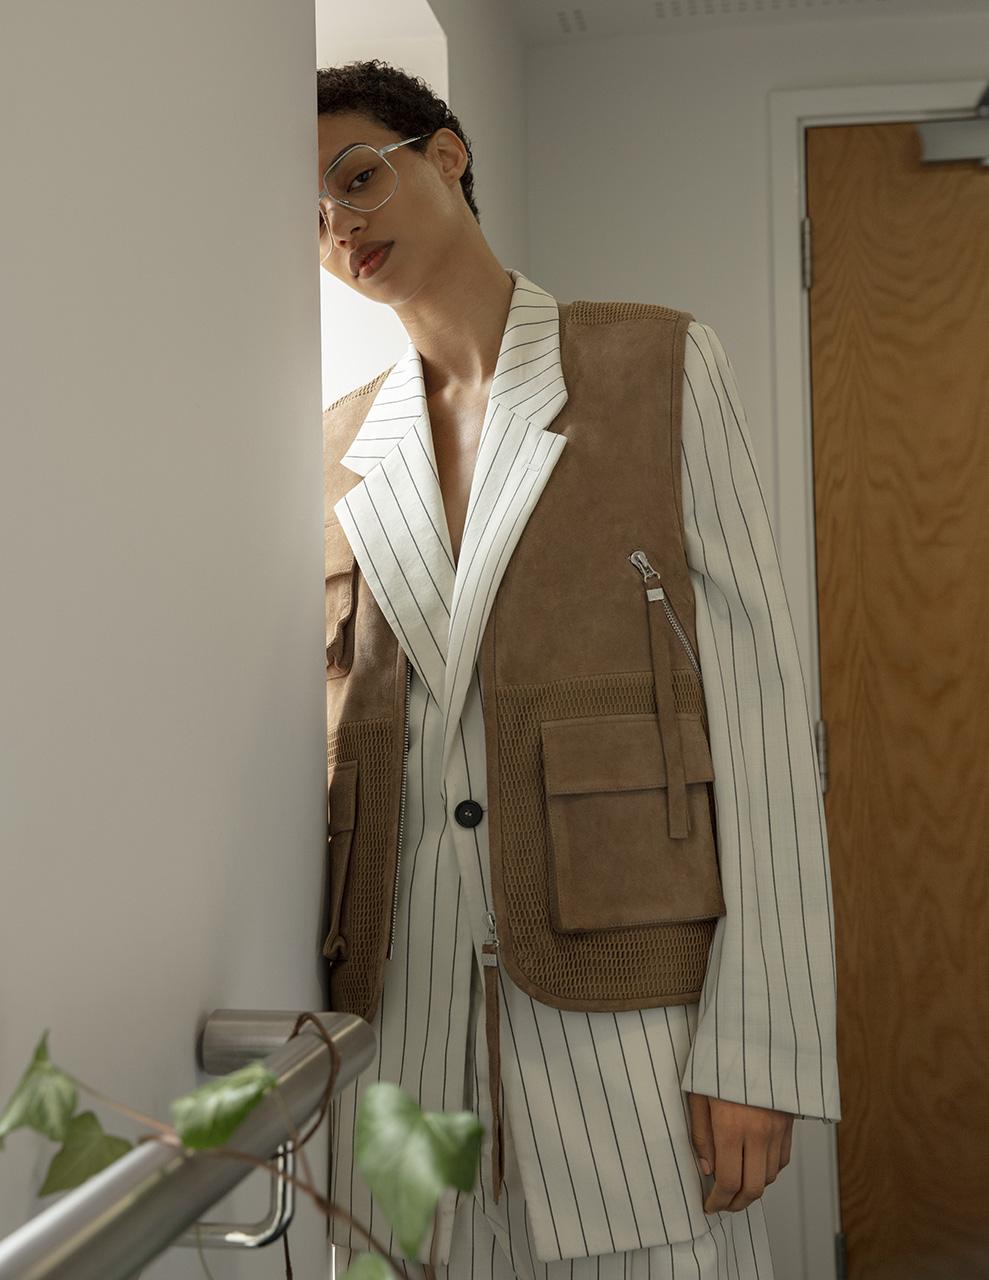 Jourdana Models1 Menswear 1359LL.jpg